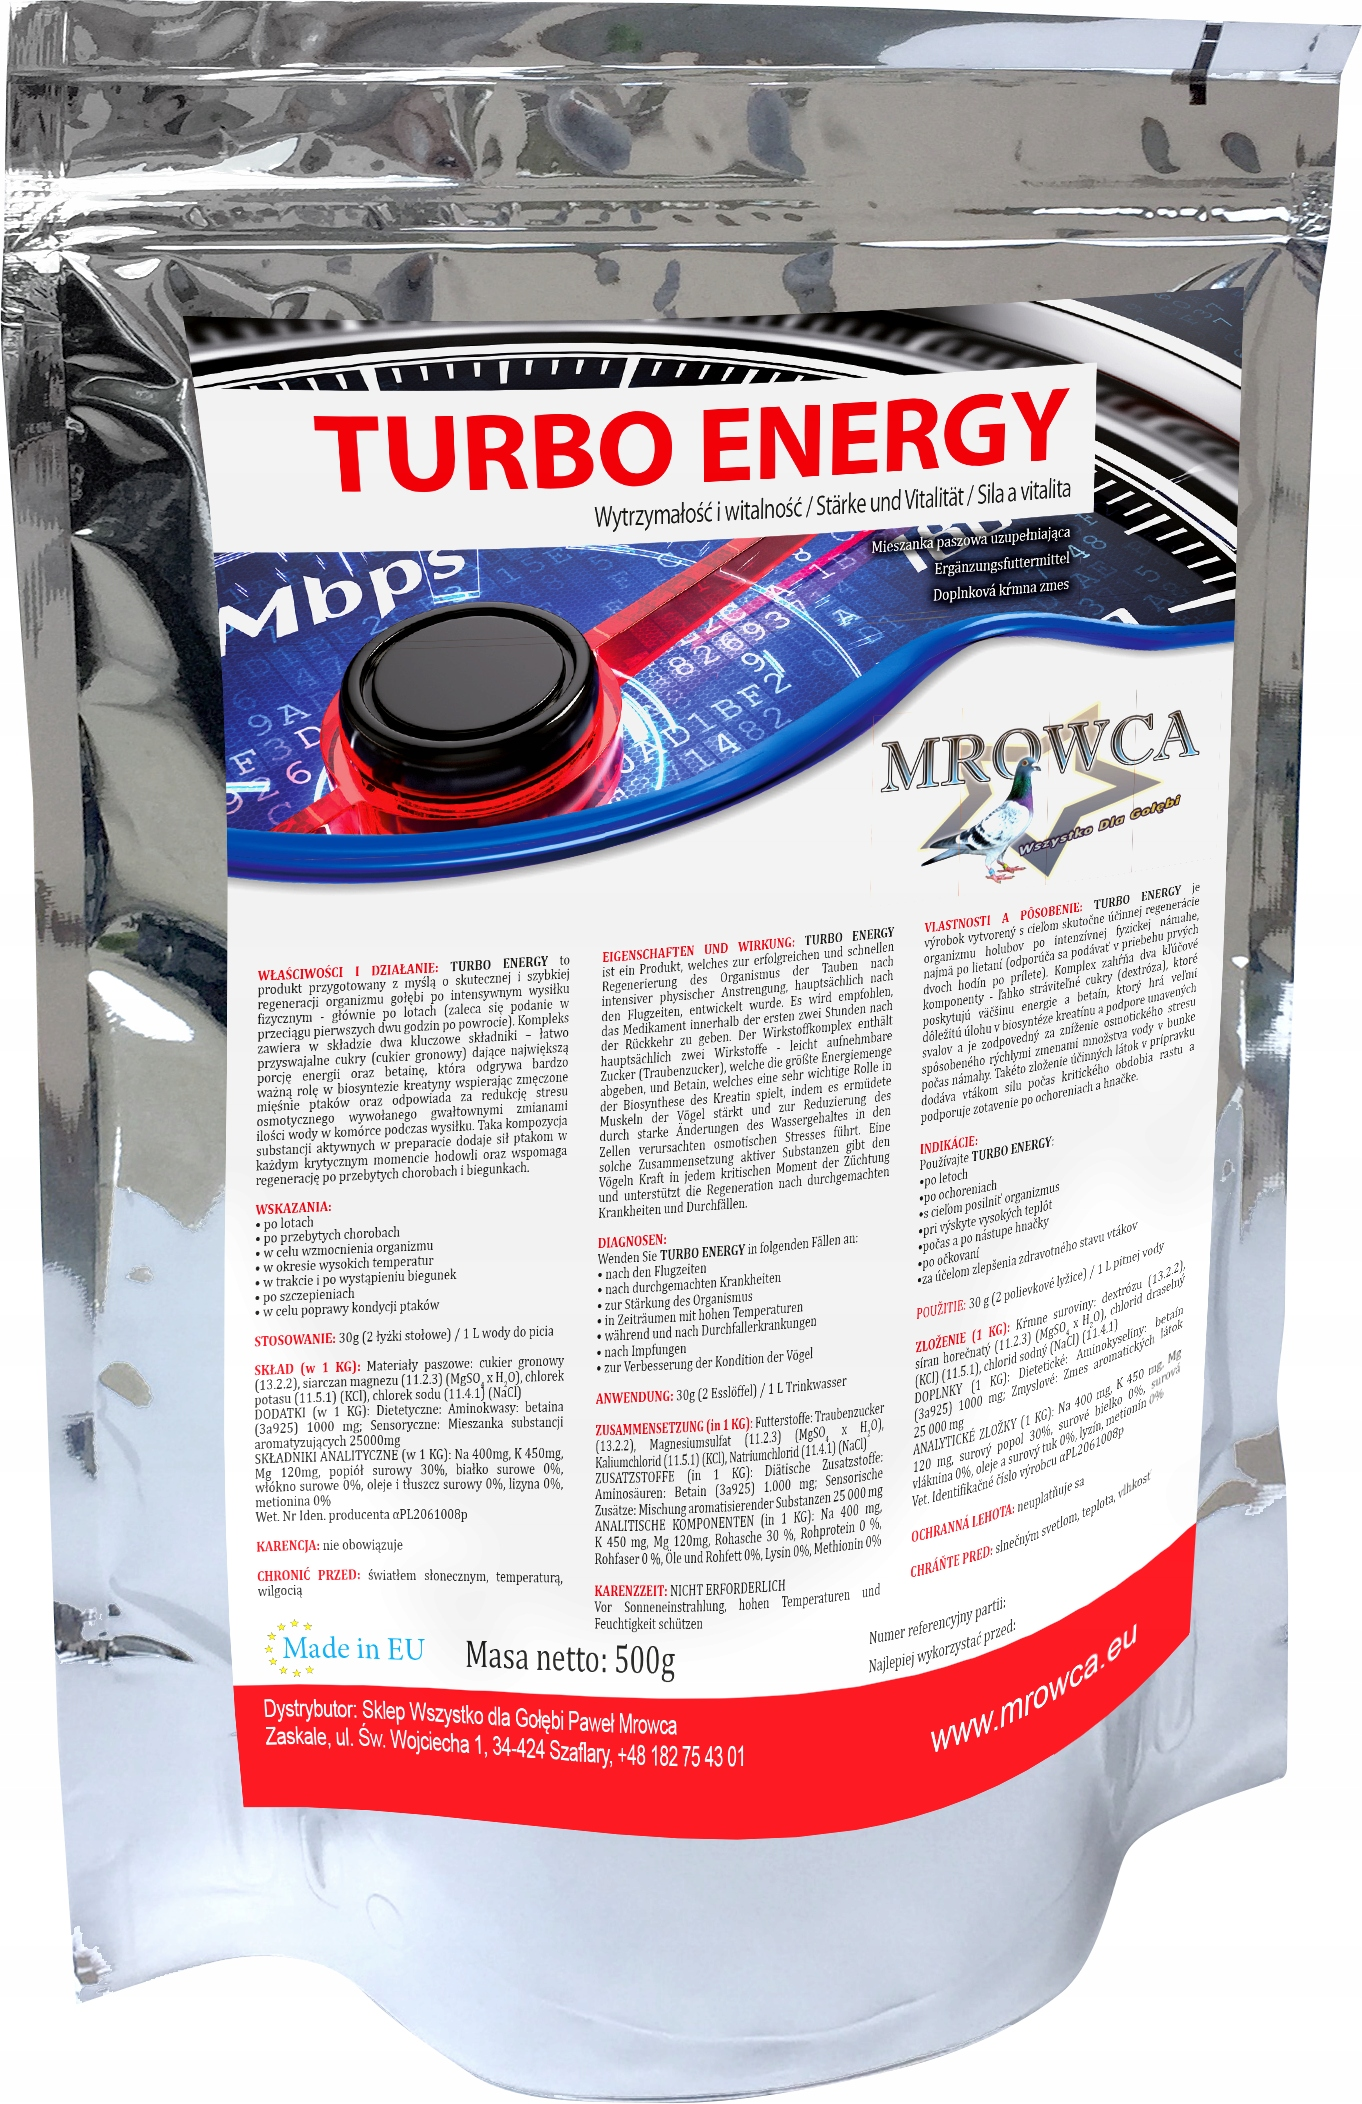 MROWCA Turbo energy 500g